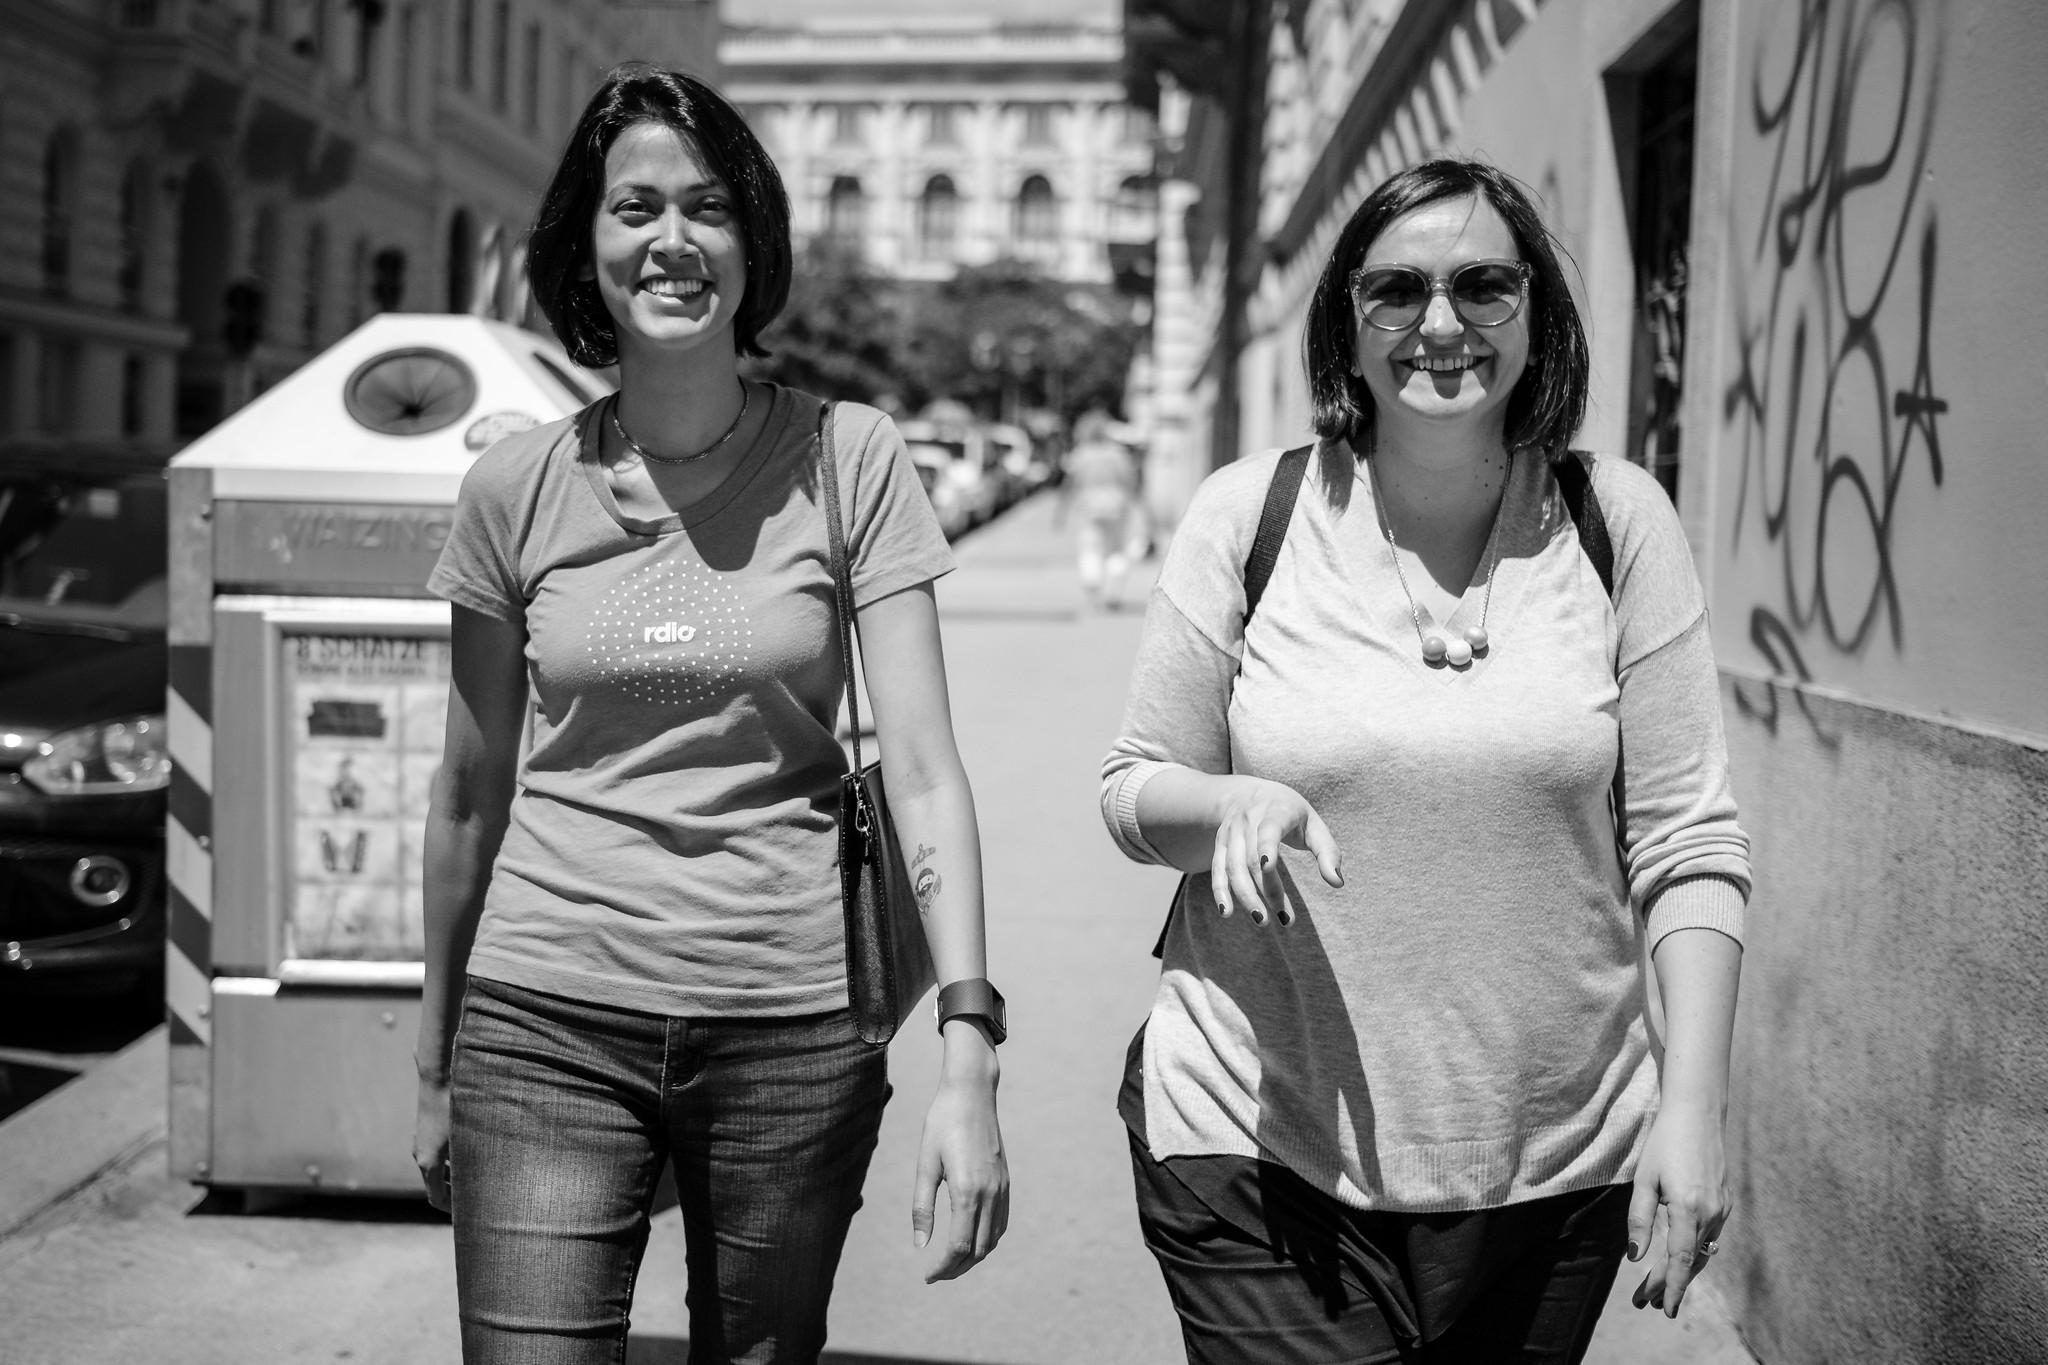 Josepha Haden and Francesca Marano walking around Vienna